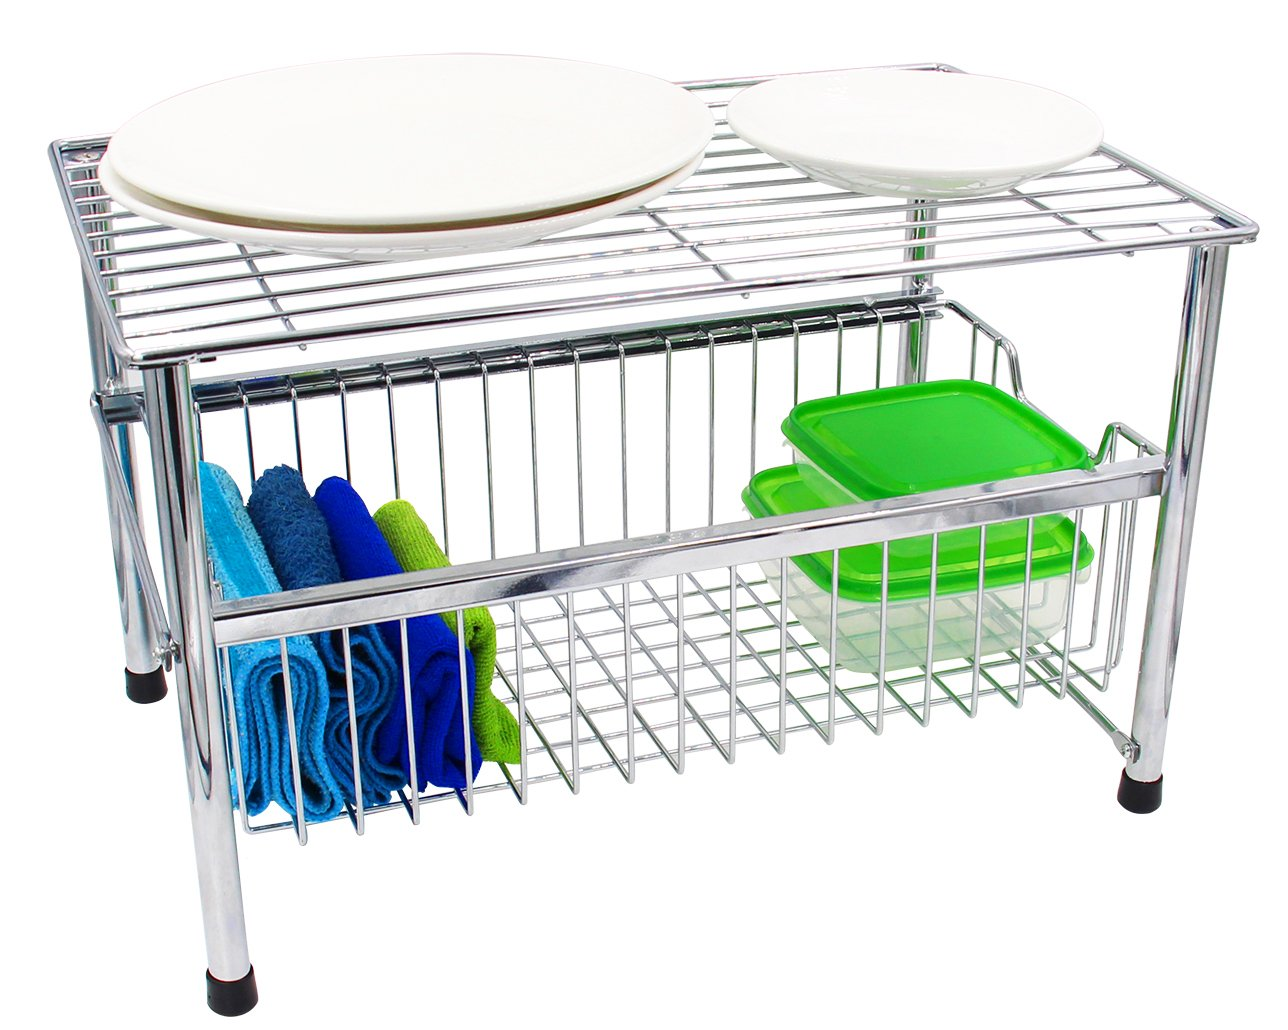 Kühlschrank Organizer Stapelbar : Esylife stapelbarer unterspülen organizer küchen korb organizer